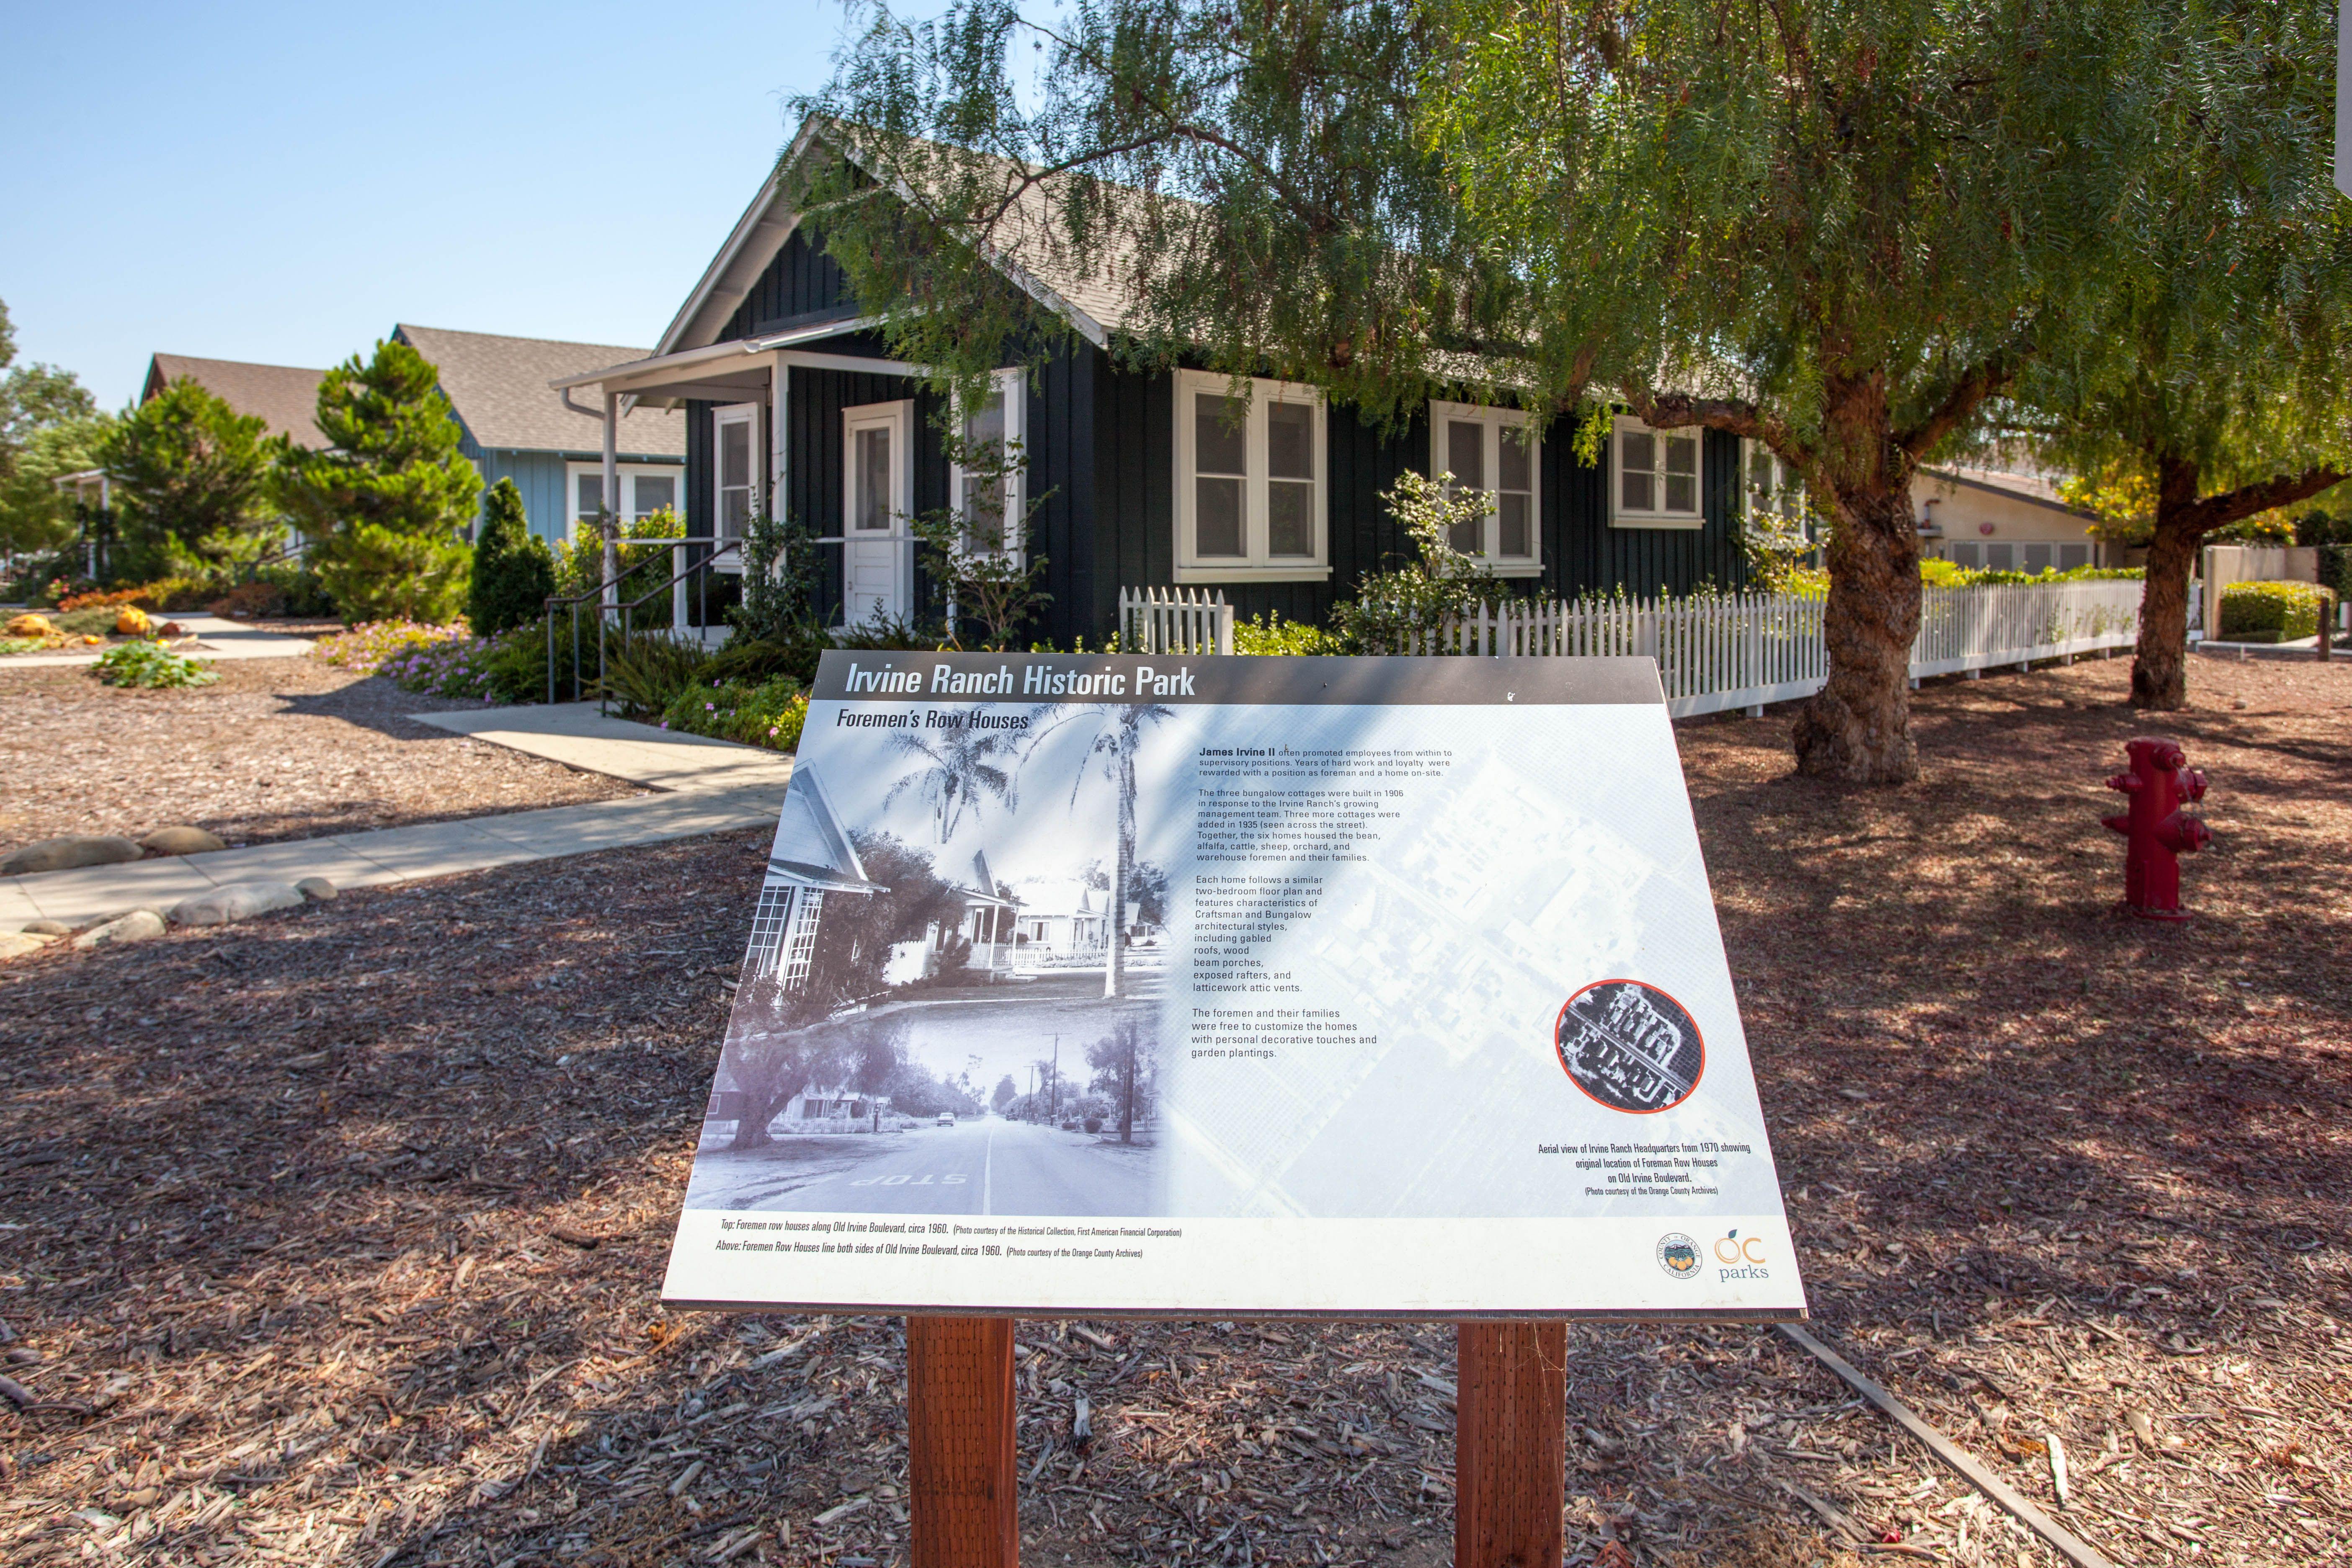 Spectra Company - Irvine Ranch Historic Park (Irvine, CA